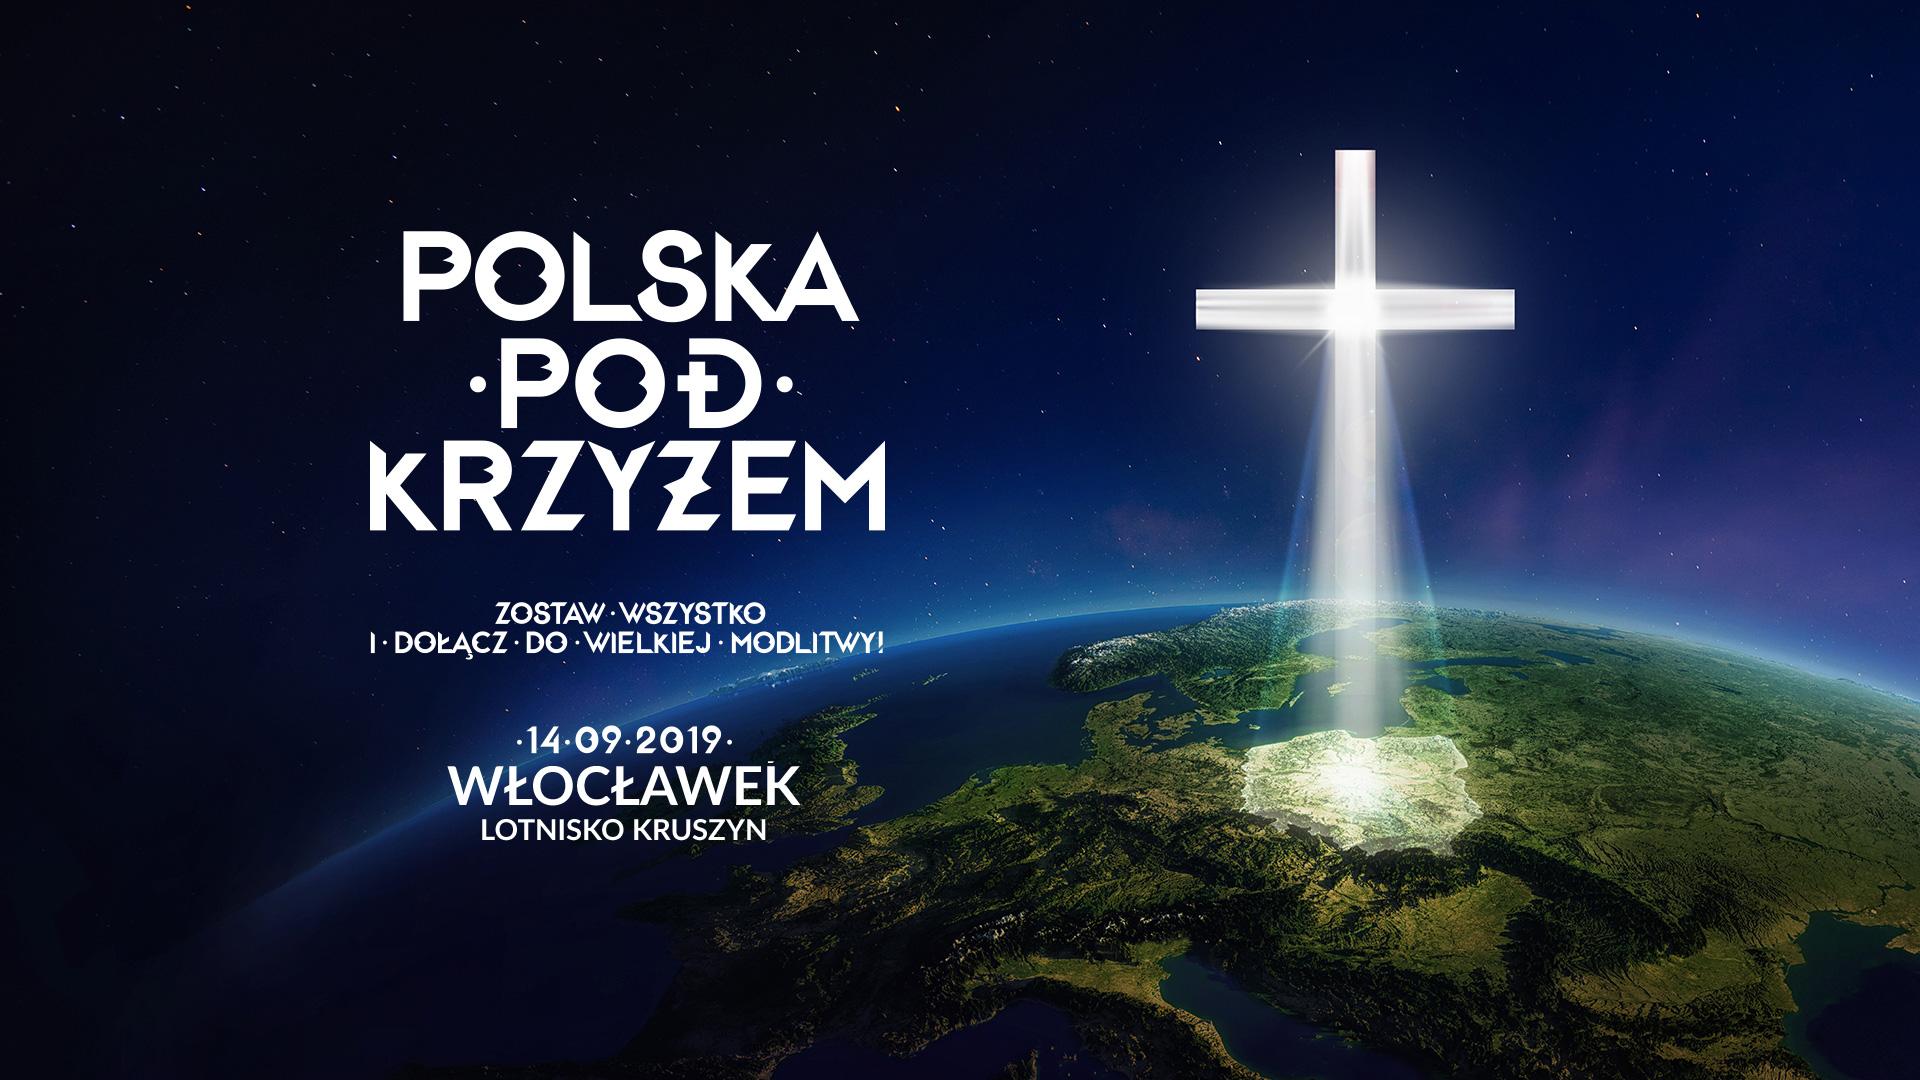 Polska pod Krzyzem